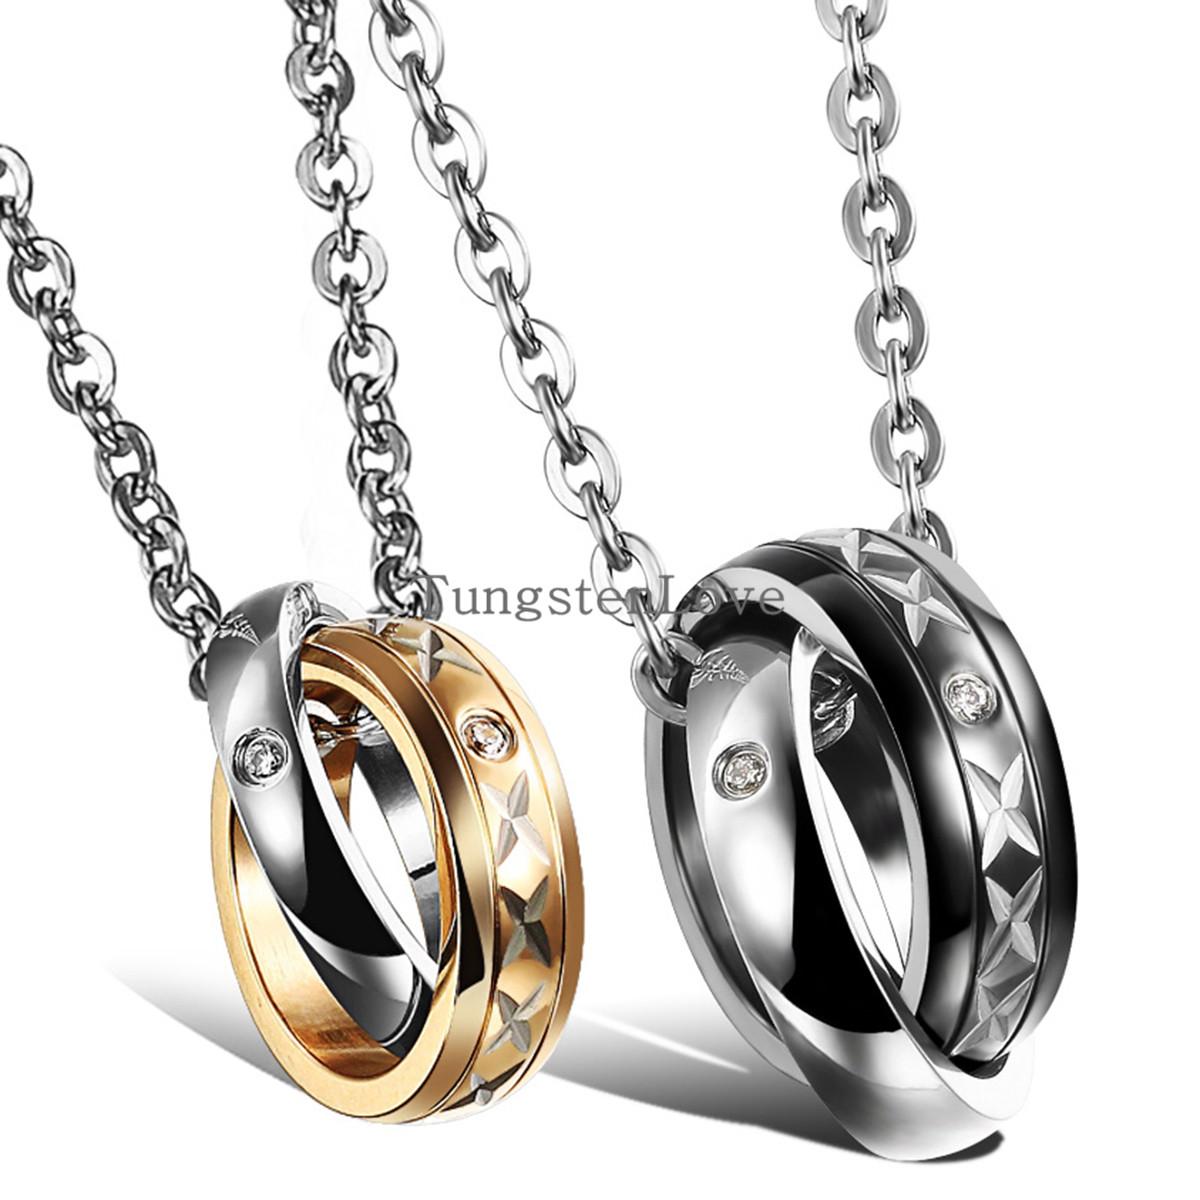 Wholesale Fashion Jewelry Couples Lovers Titanium Steel Zircon Two Circles Pendant Necklace Men Women Gold & Black collares 2015(China (Mainland))